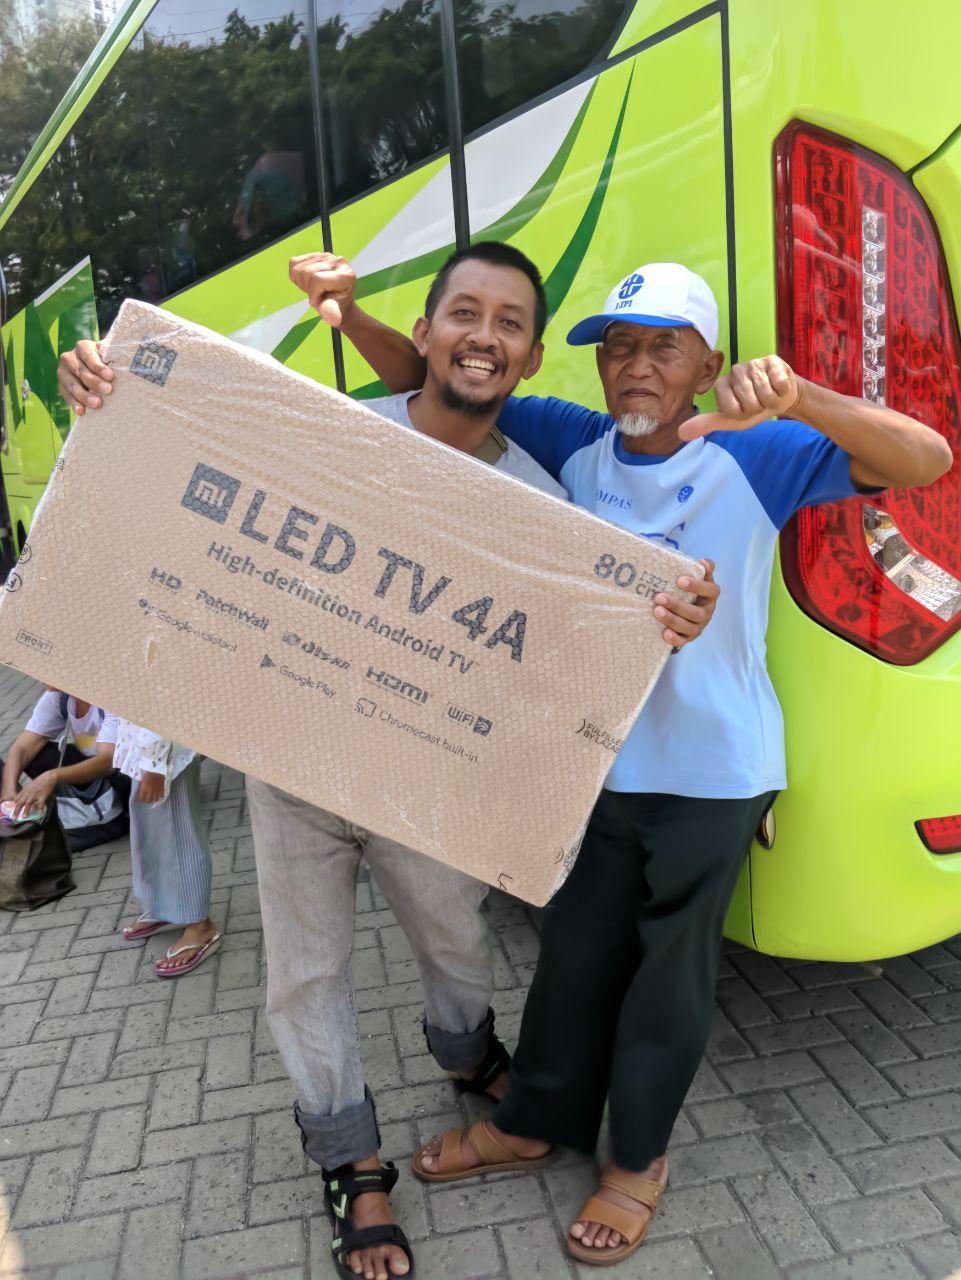 Beli LED TV 4A Xiaomi Online ambil di Jakarta